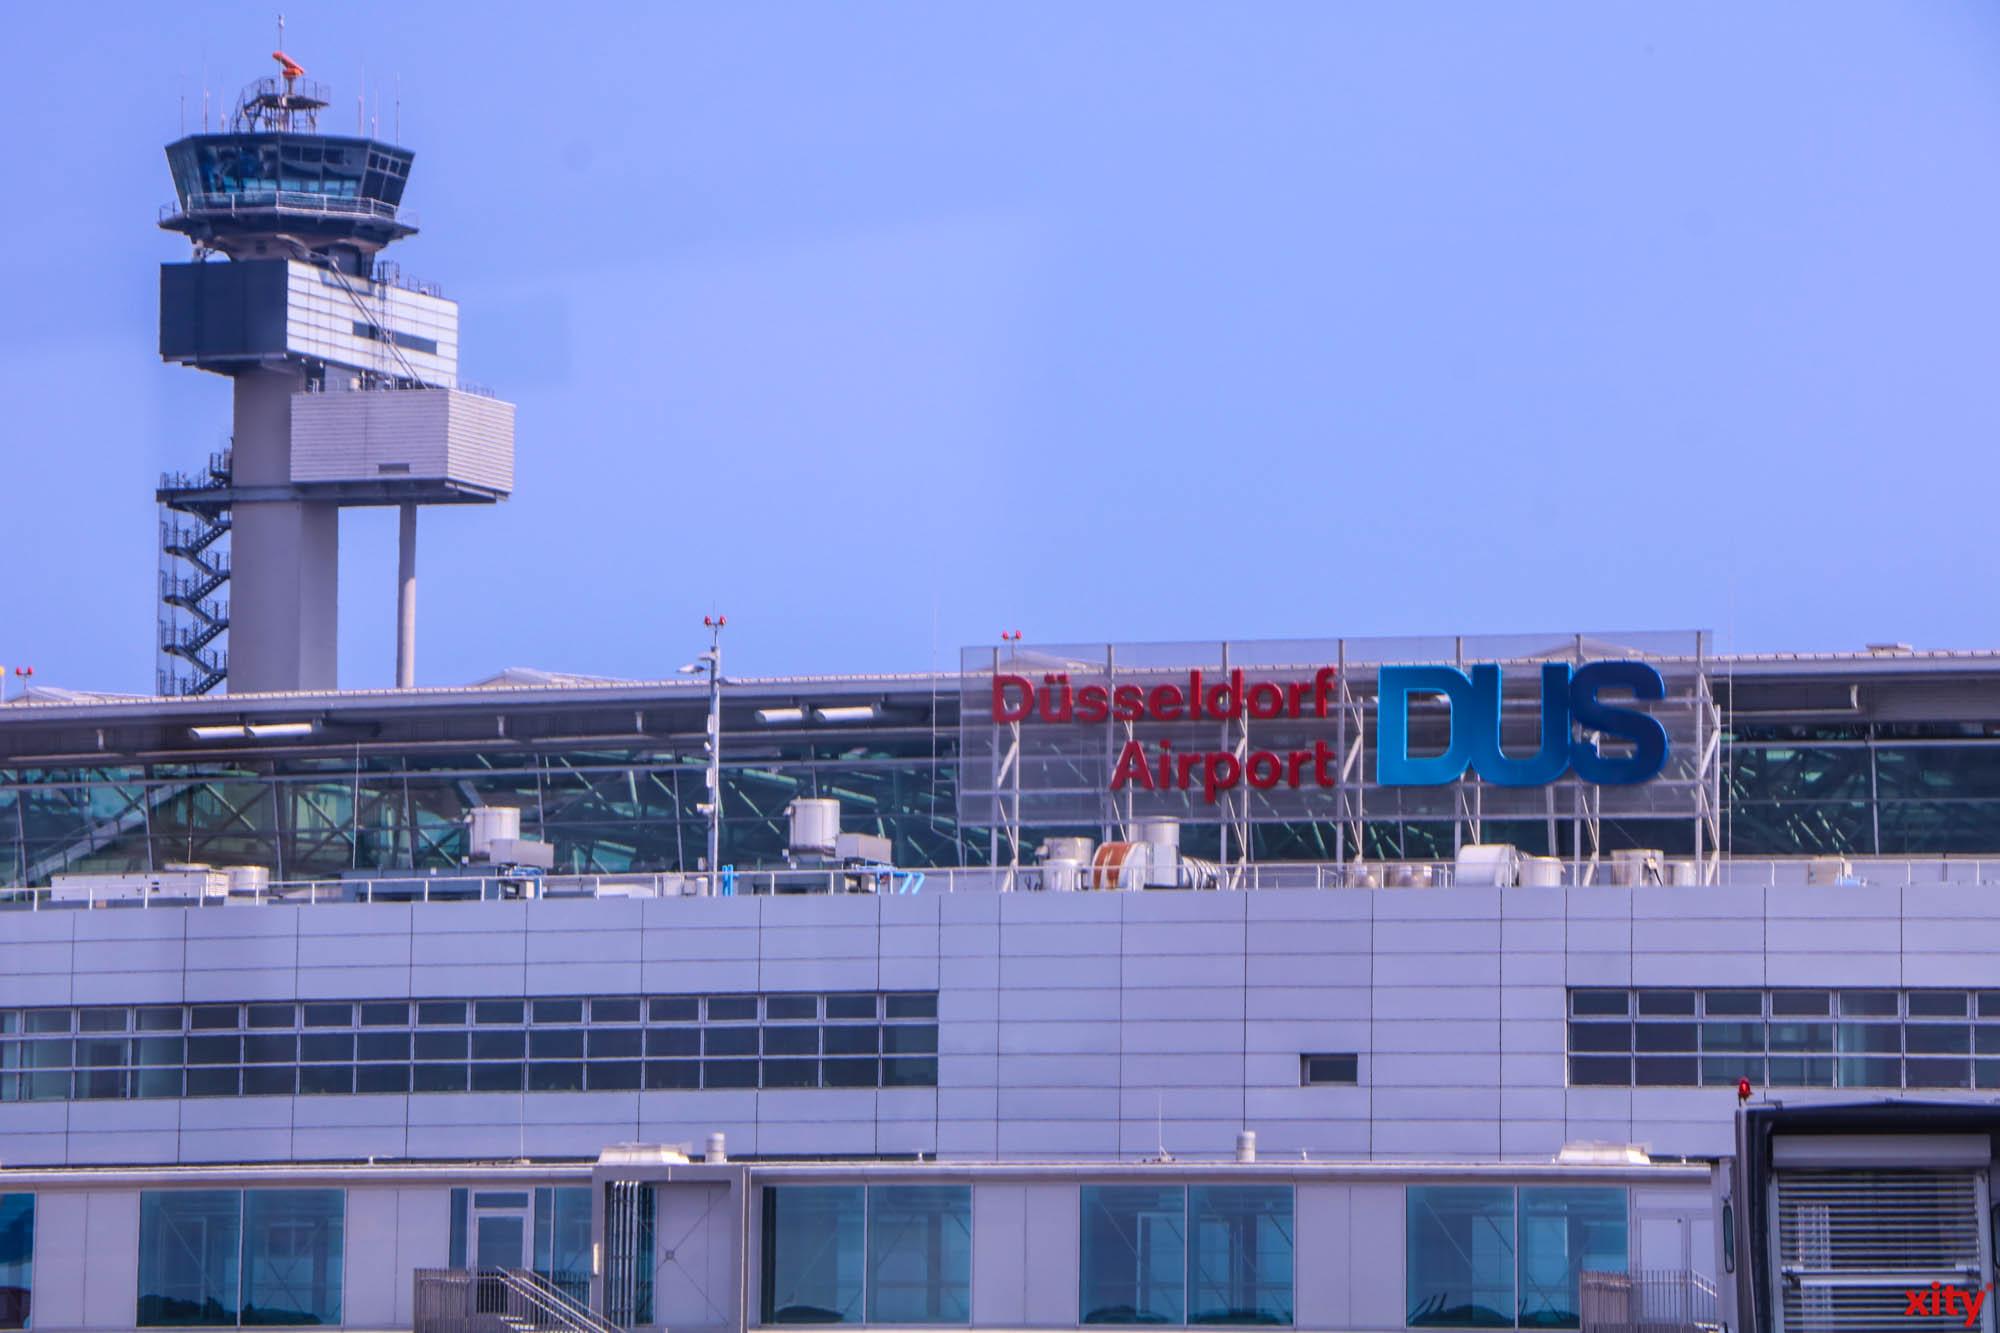 Düsseldorfer Airport erwartet in den Sommerferien fast 3,9 Millionen Passagiere (Foto: xity)